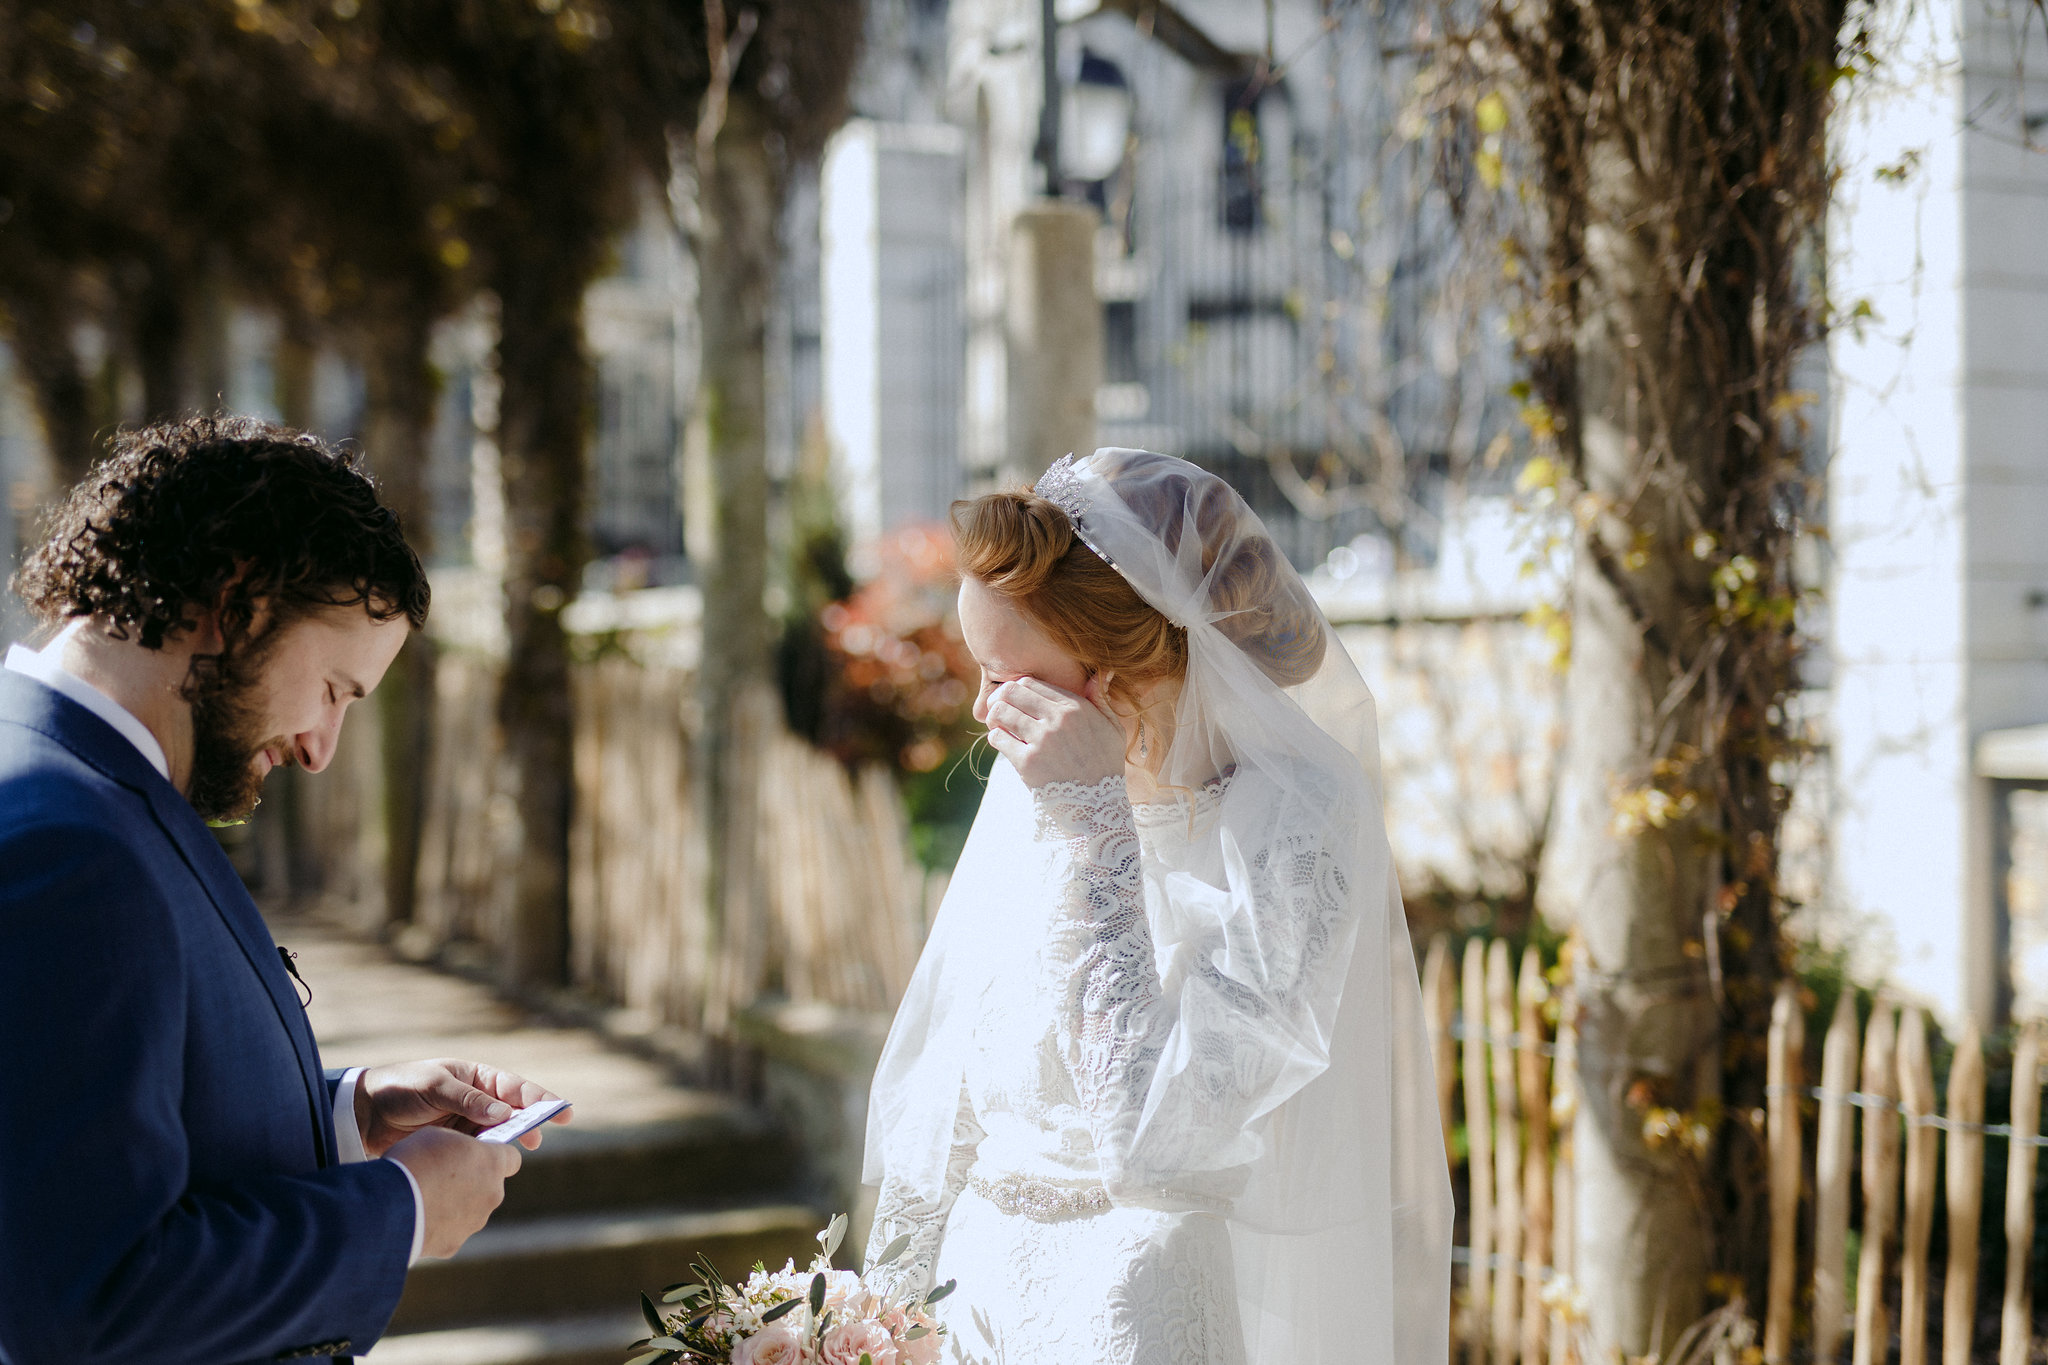 Paris_elopement_wedding_photographer-180.jpg